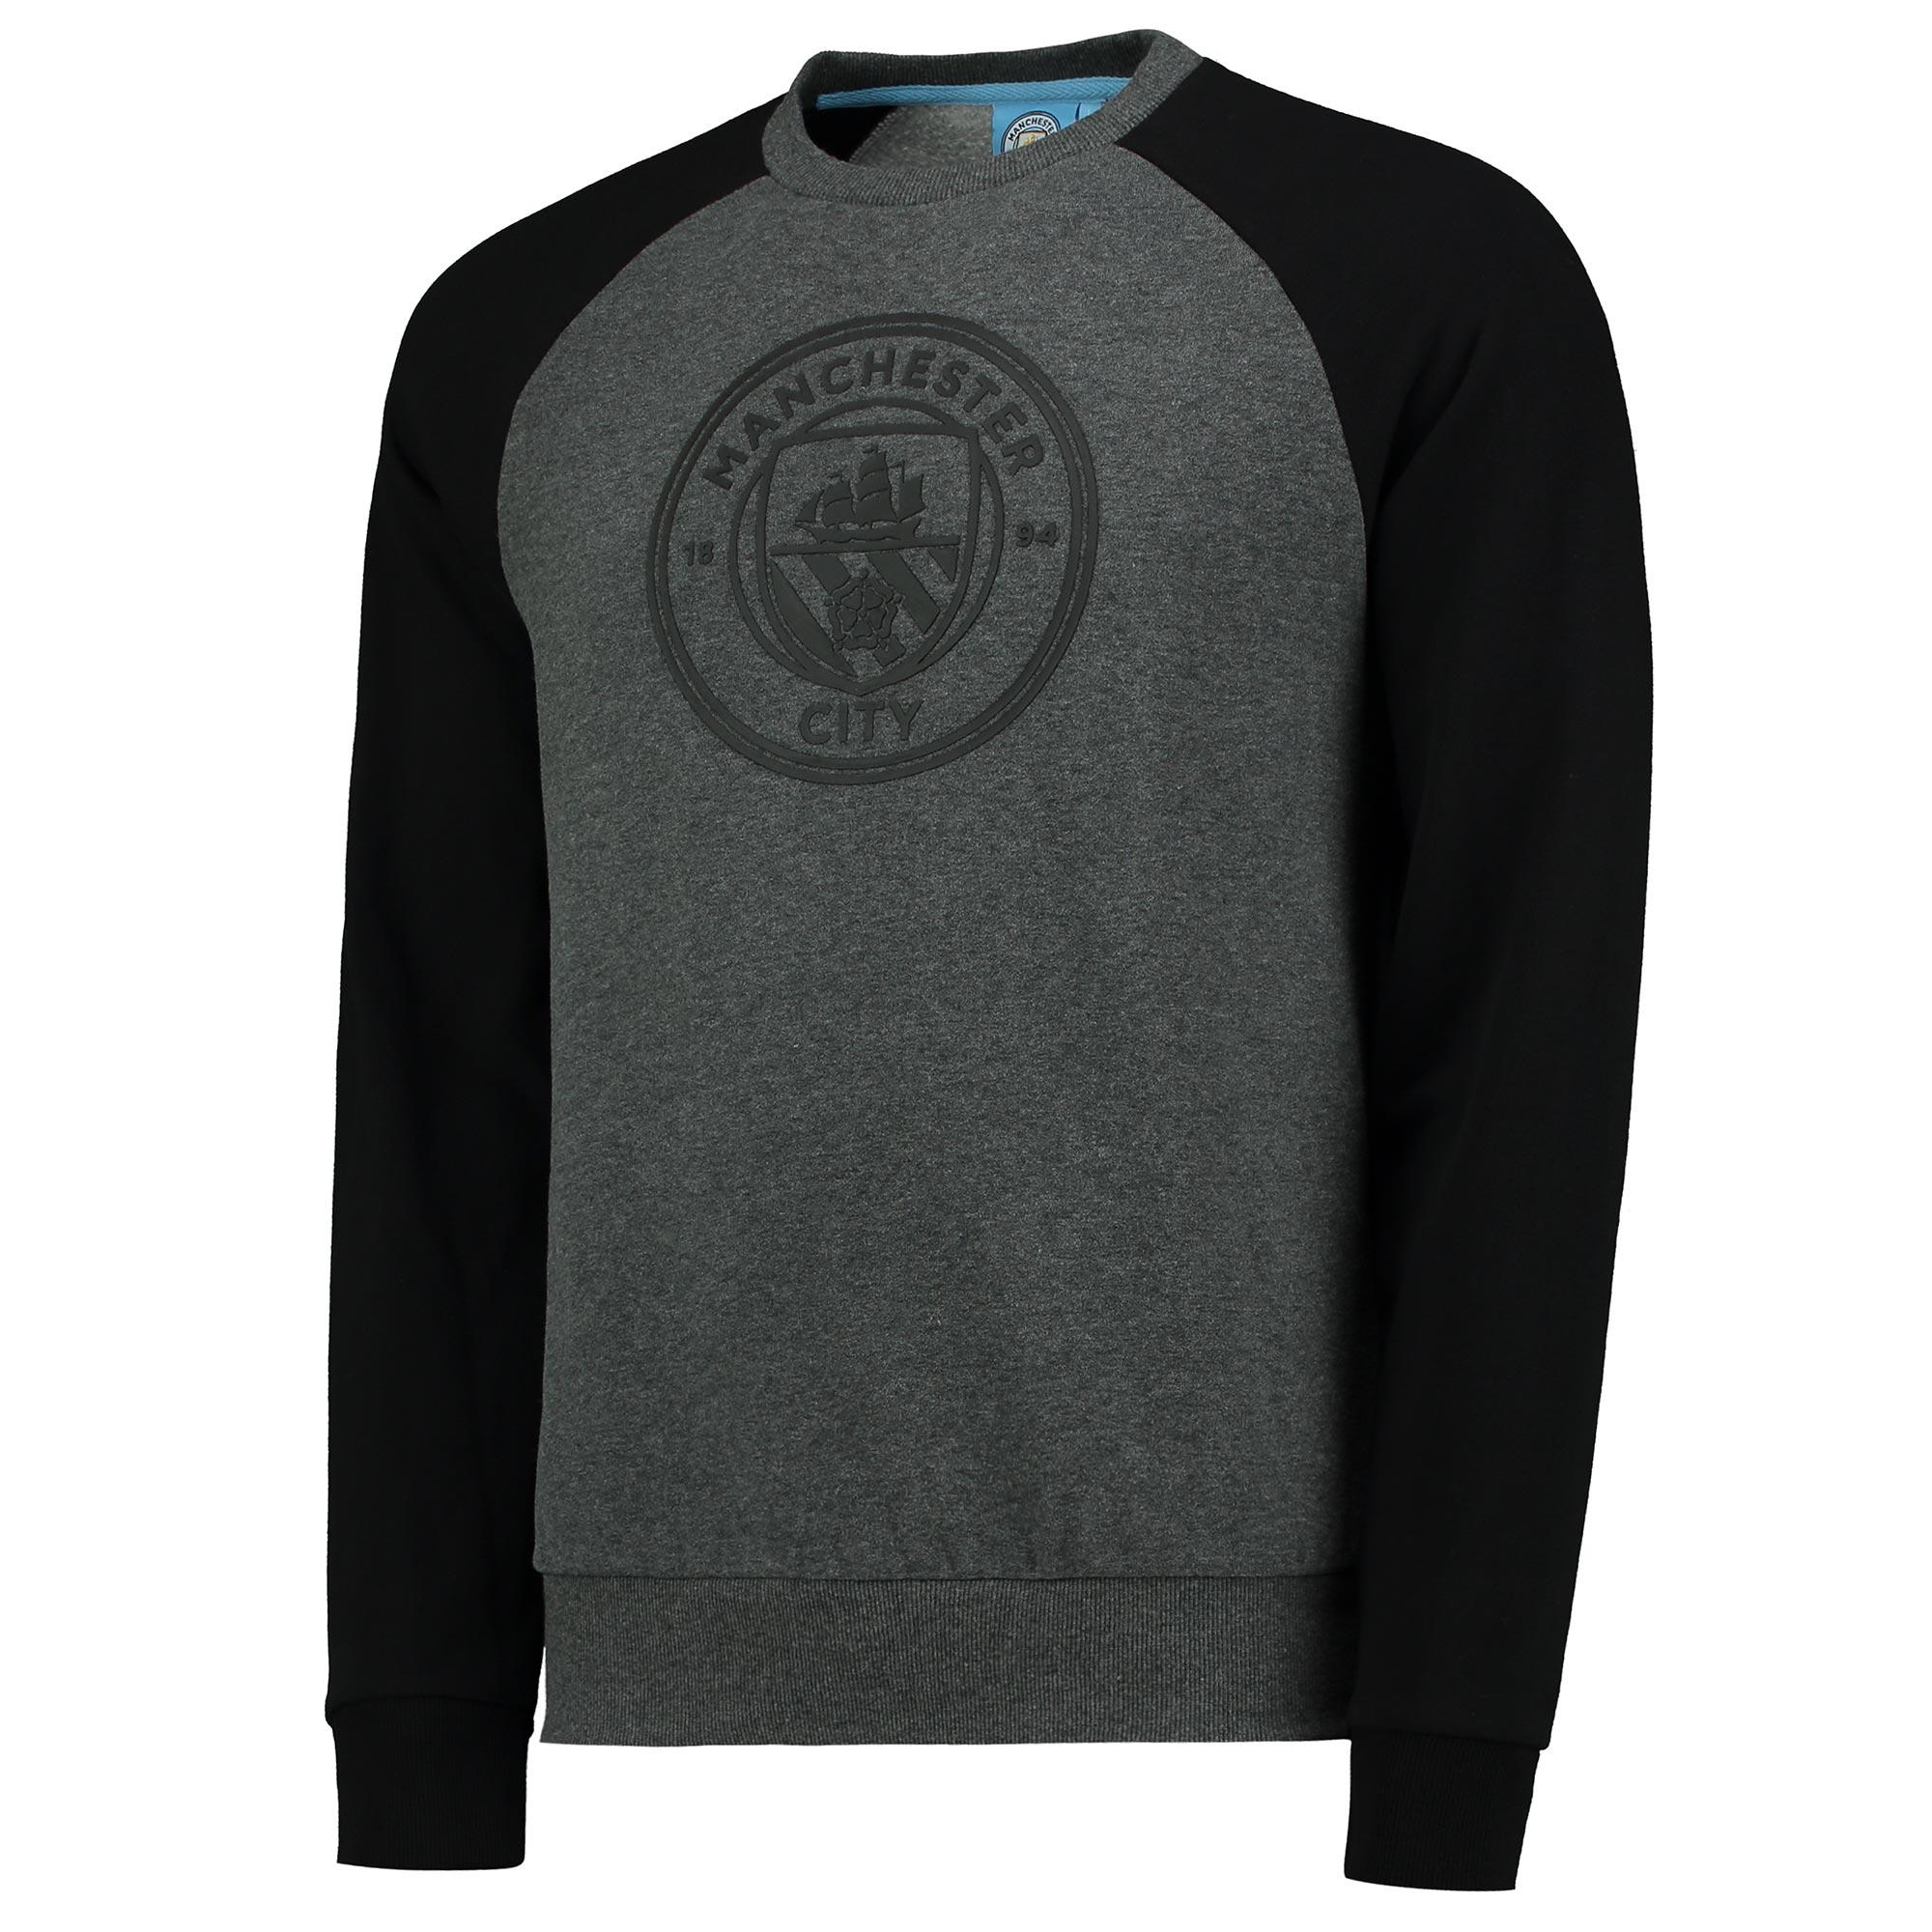 Manchester City Classic Raglan Sweatshirt - Grey/Black